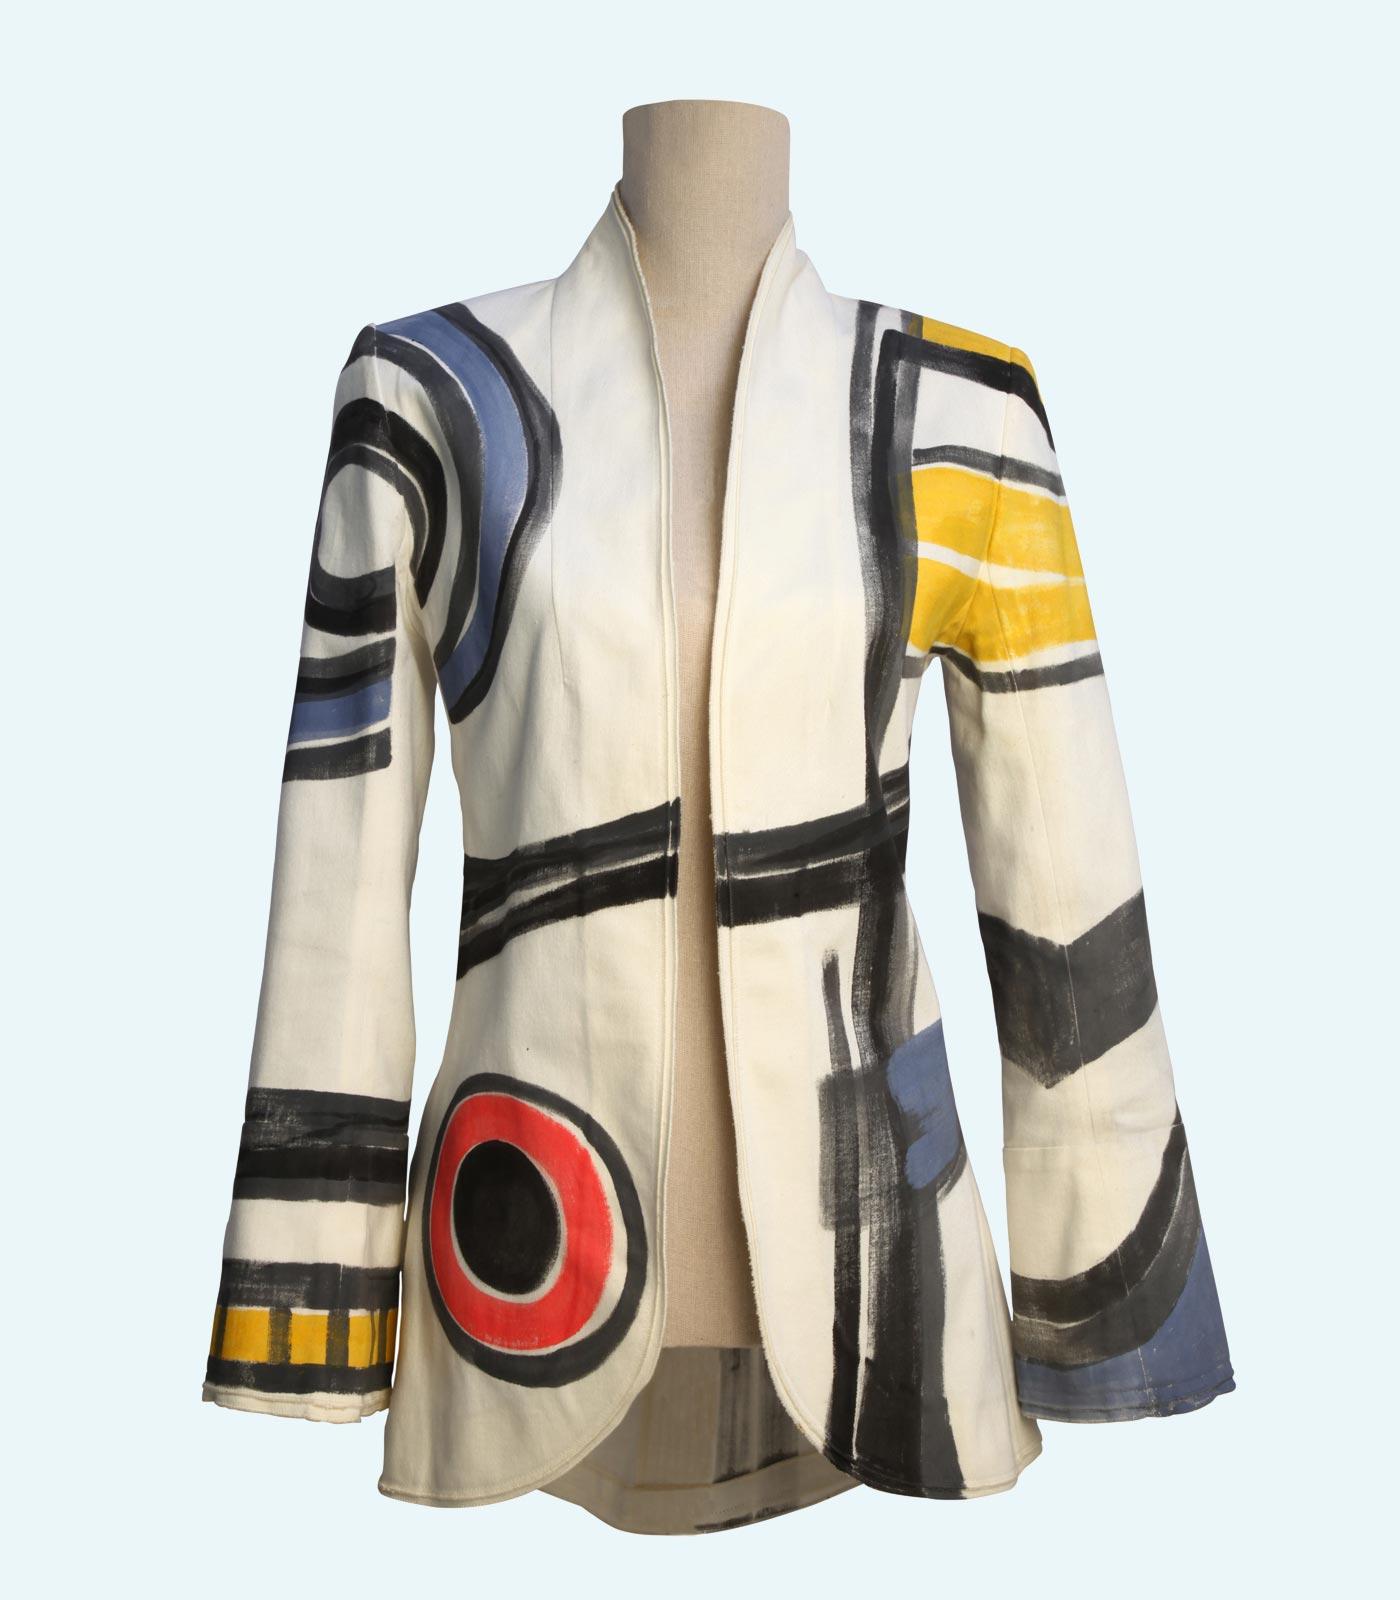 reputable site c2bd3 aa348 Giacca in cotone denim elegante da donna - Fashion Art ...